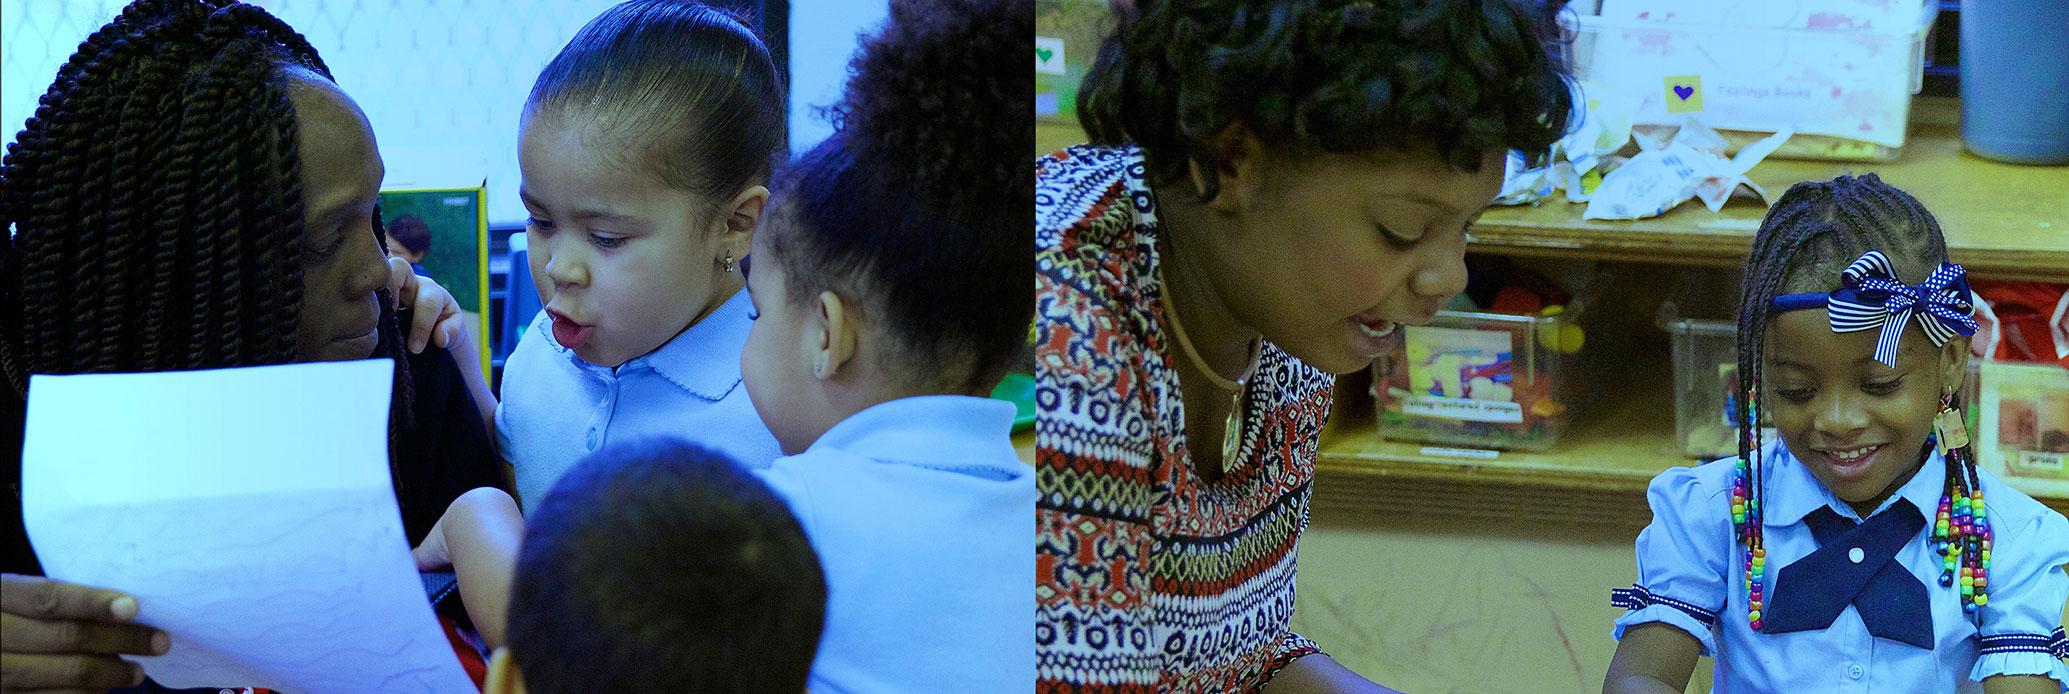 home slider 2 - Brooklyn Kindergarten Society